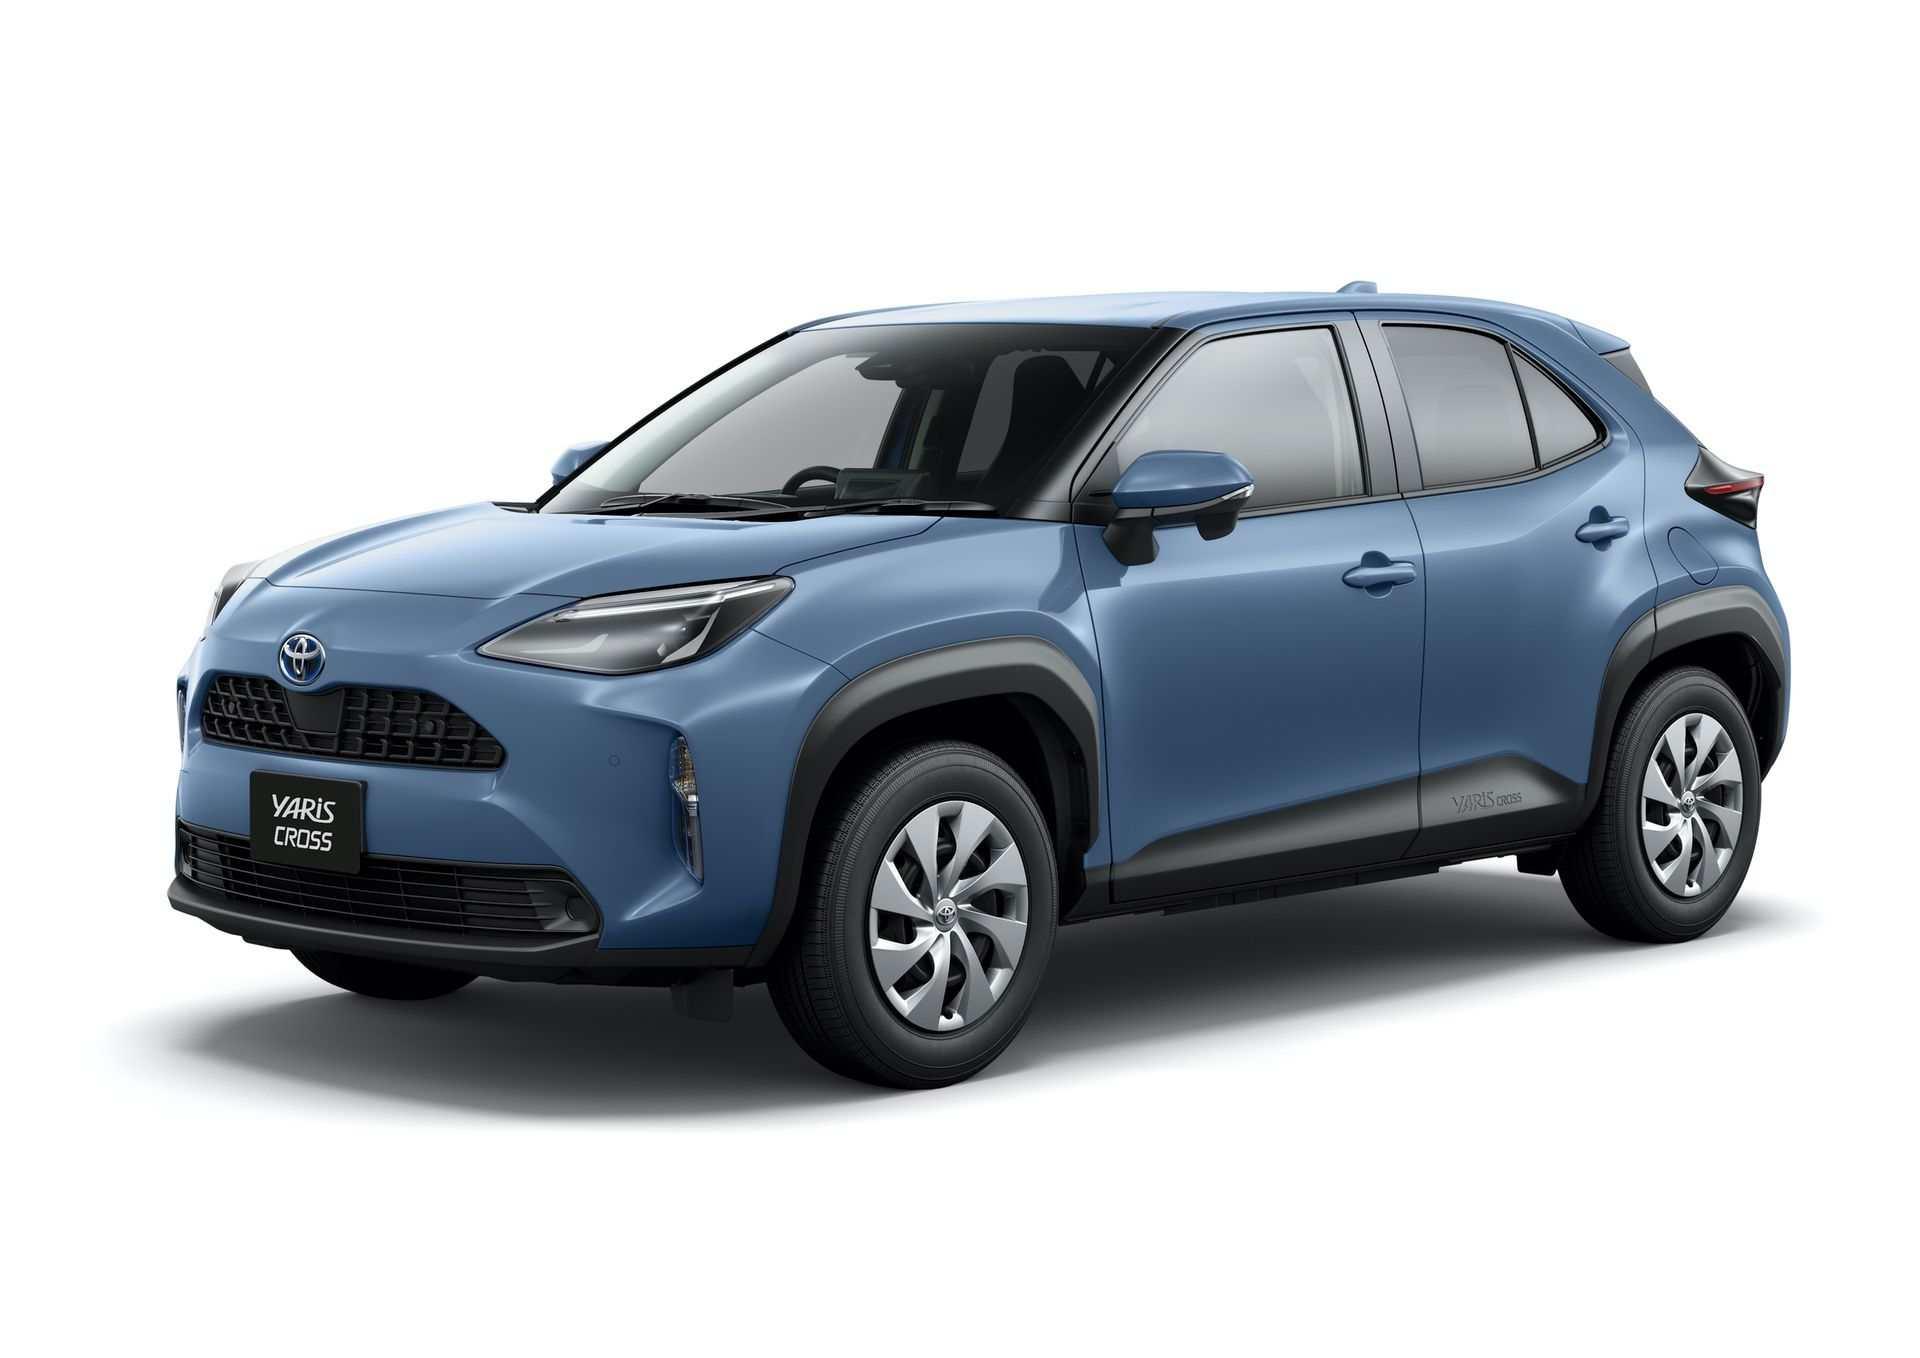 2020_Toyota_Yaris_Cross_JDM_0010